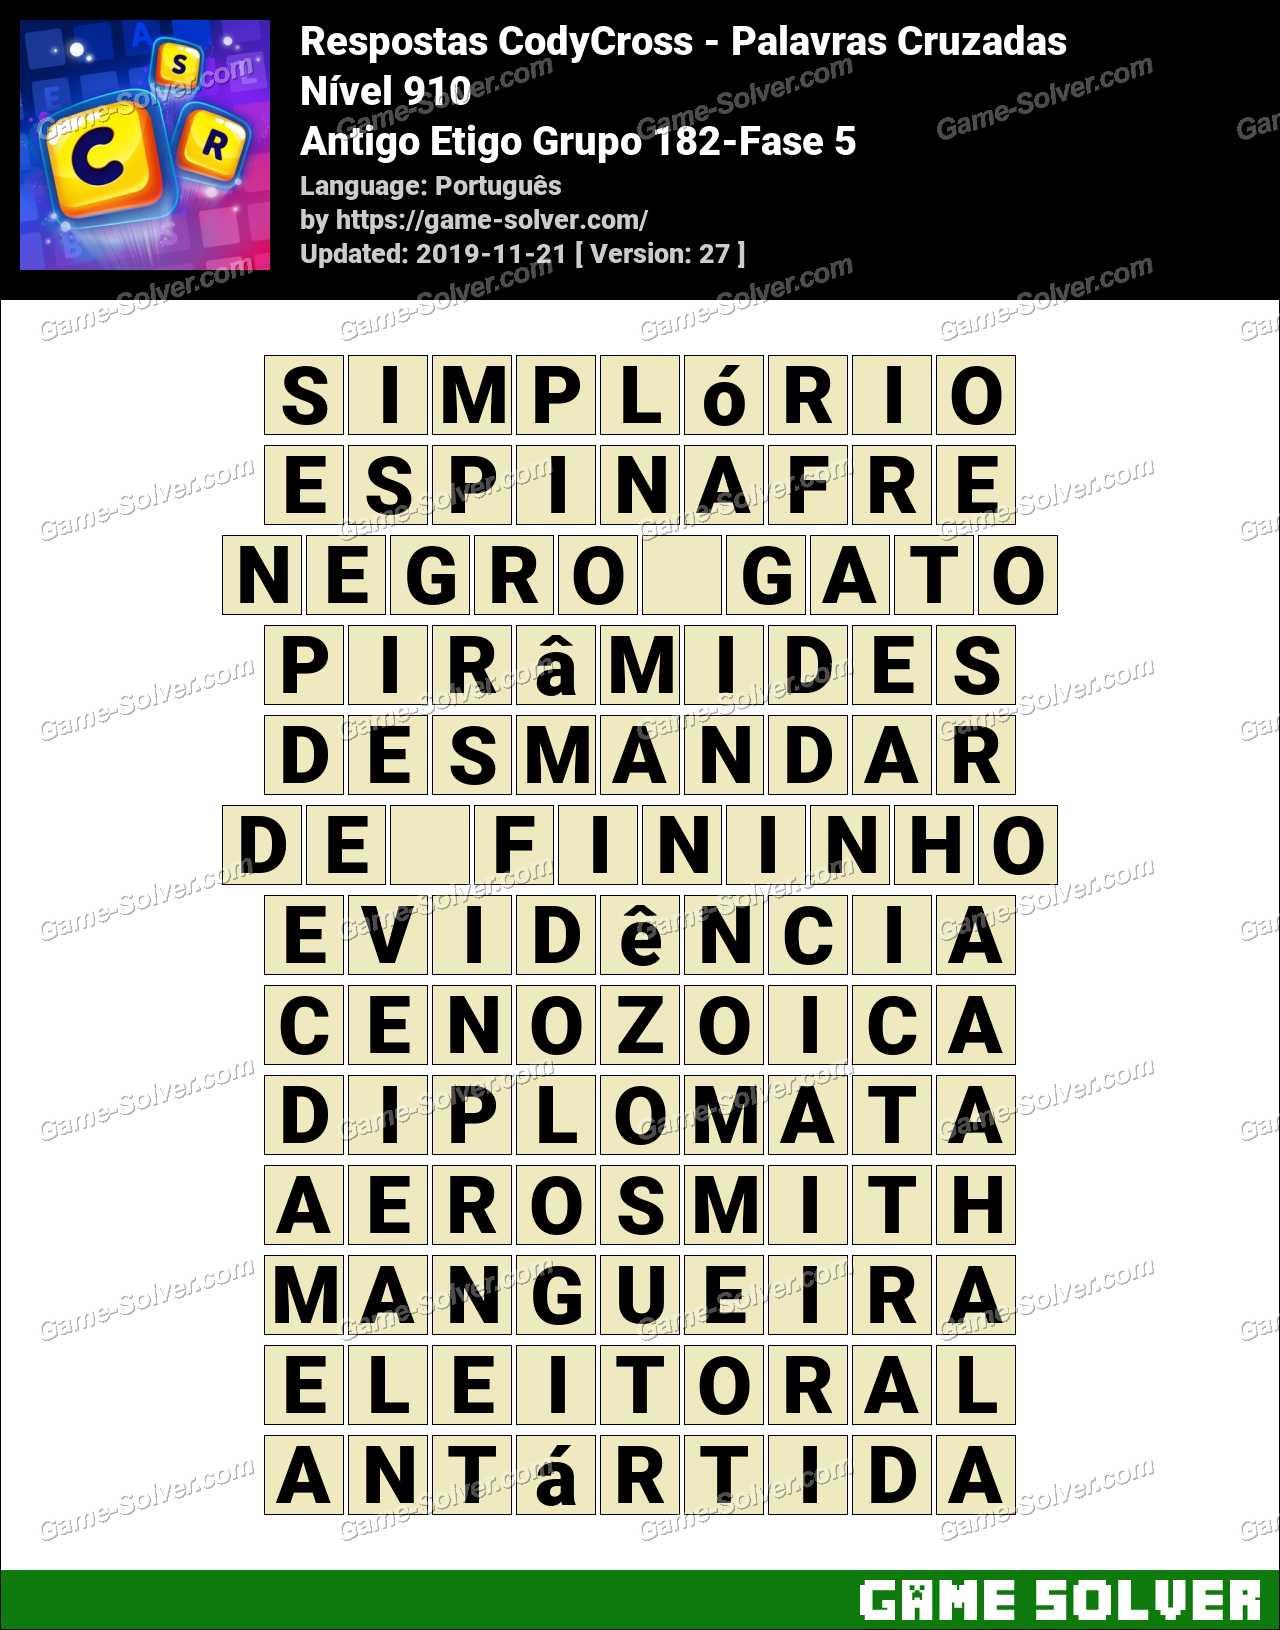 Respostas CodyCross Antigo Etigo Grupo 182-Fase 5